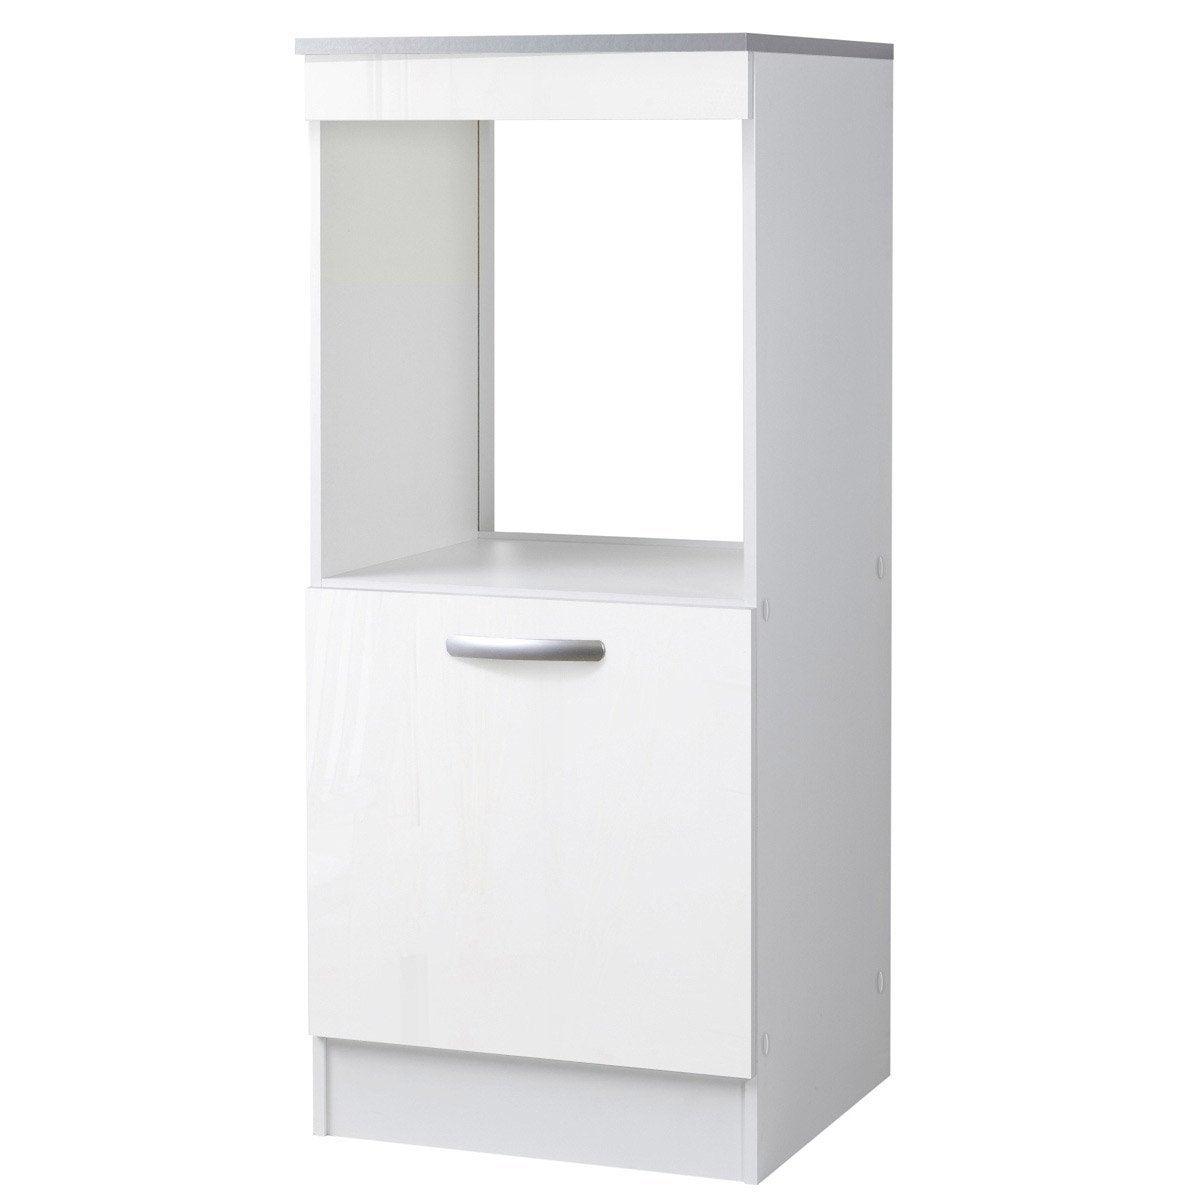 Meuble de cuisine 1 2 colonne 1 porte blanc brillant - Porte meuble cuisine leroy merlin ...